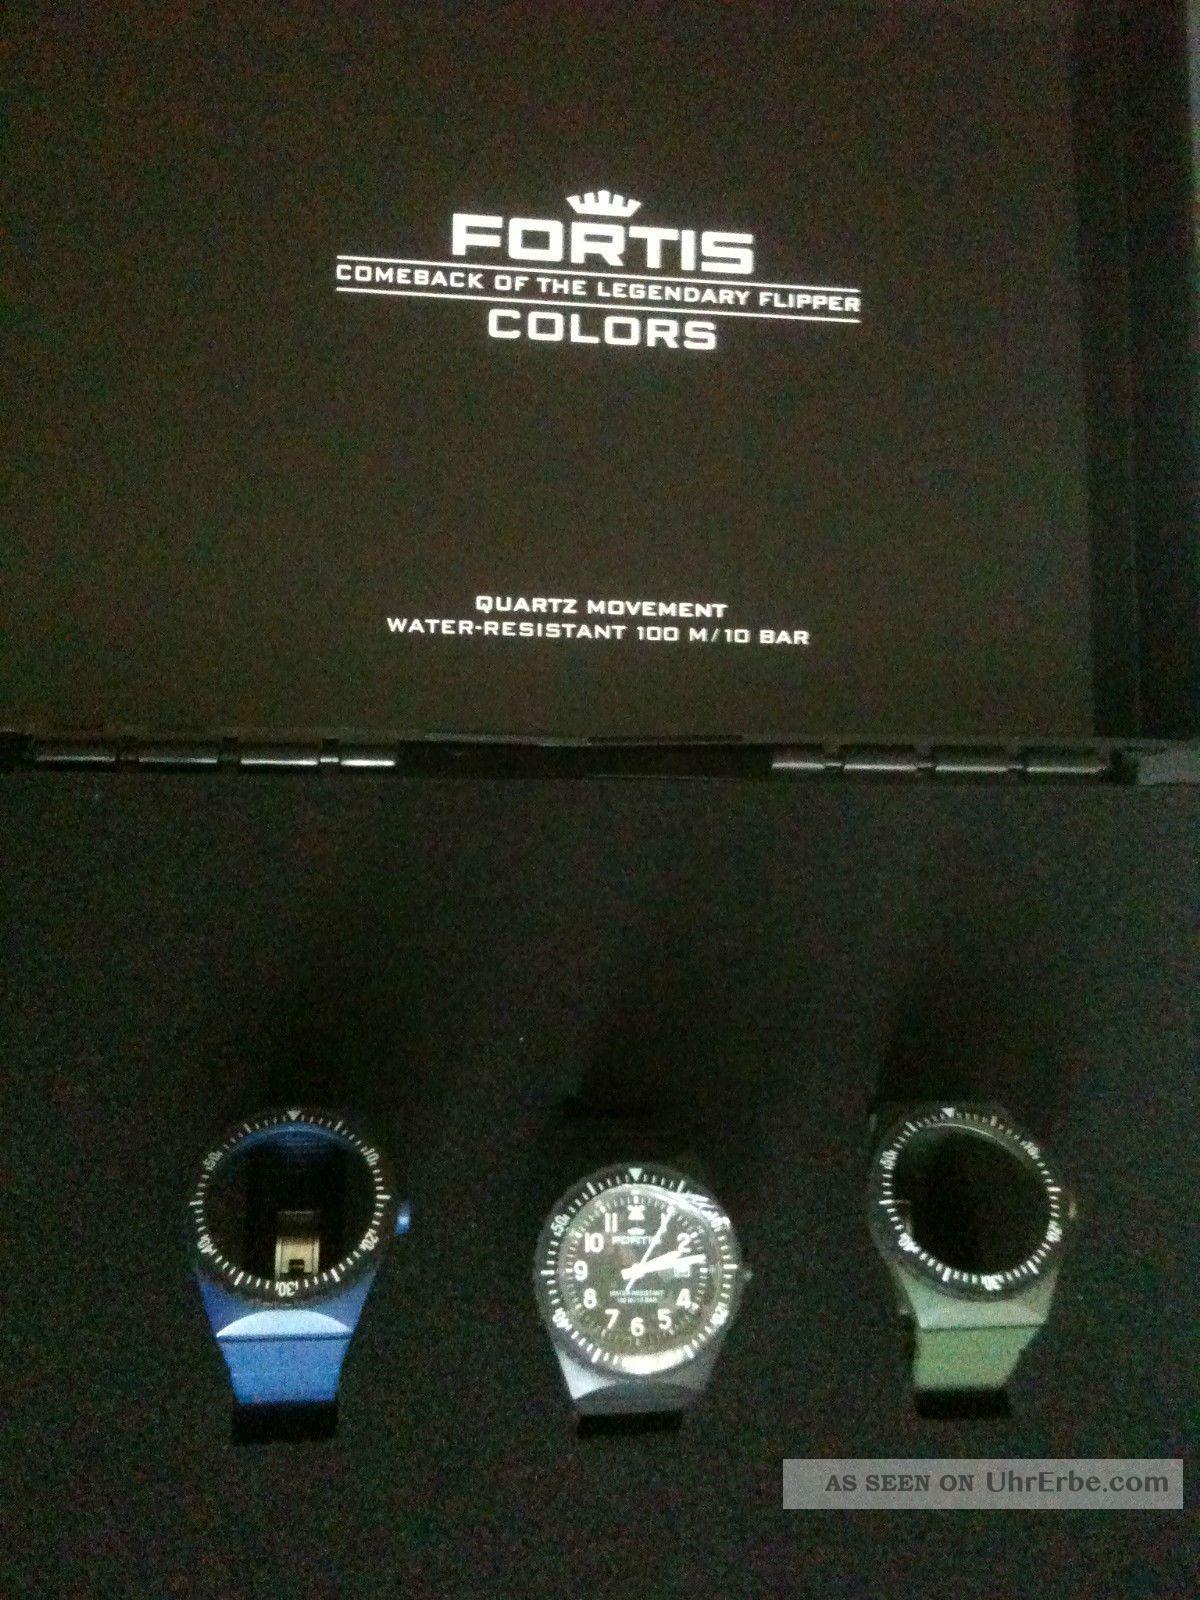 Fortis Colours Koffer,  Mit 3 Armbänder,  1x Fortis Quarzwerk Armbanduhren Bild